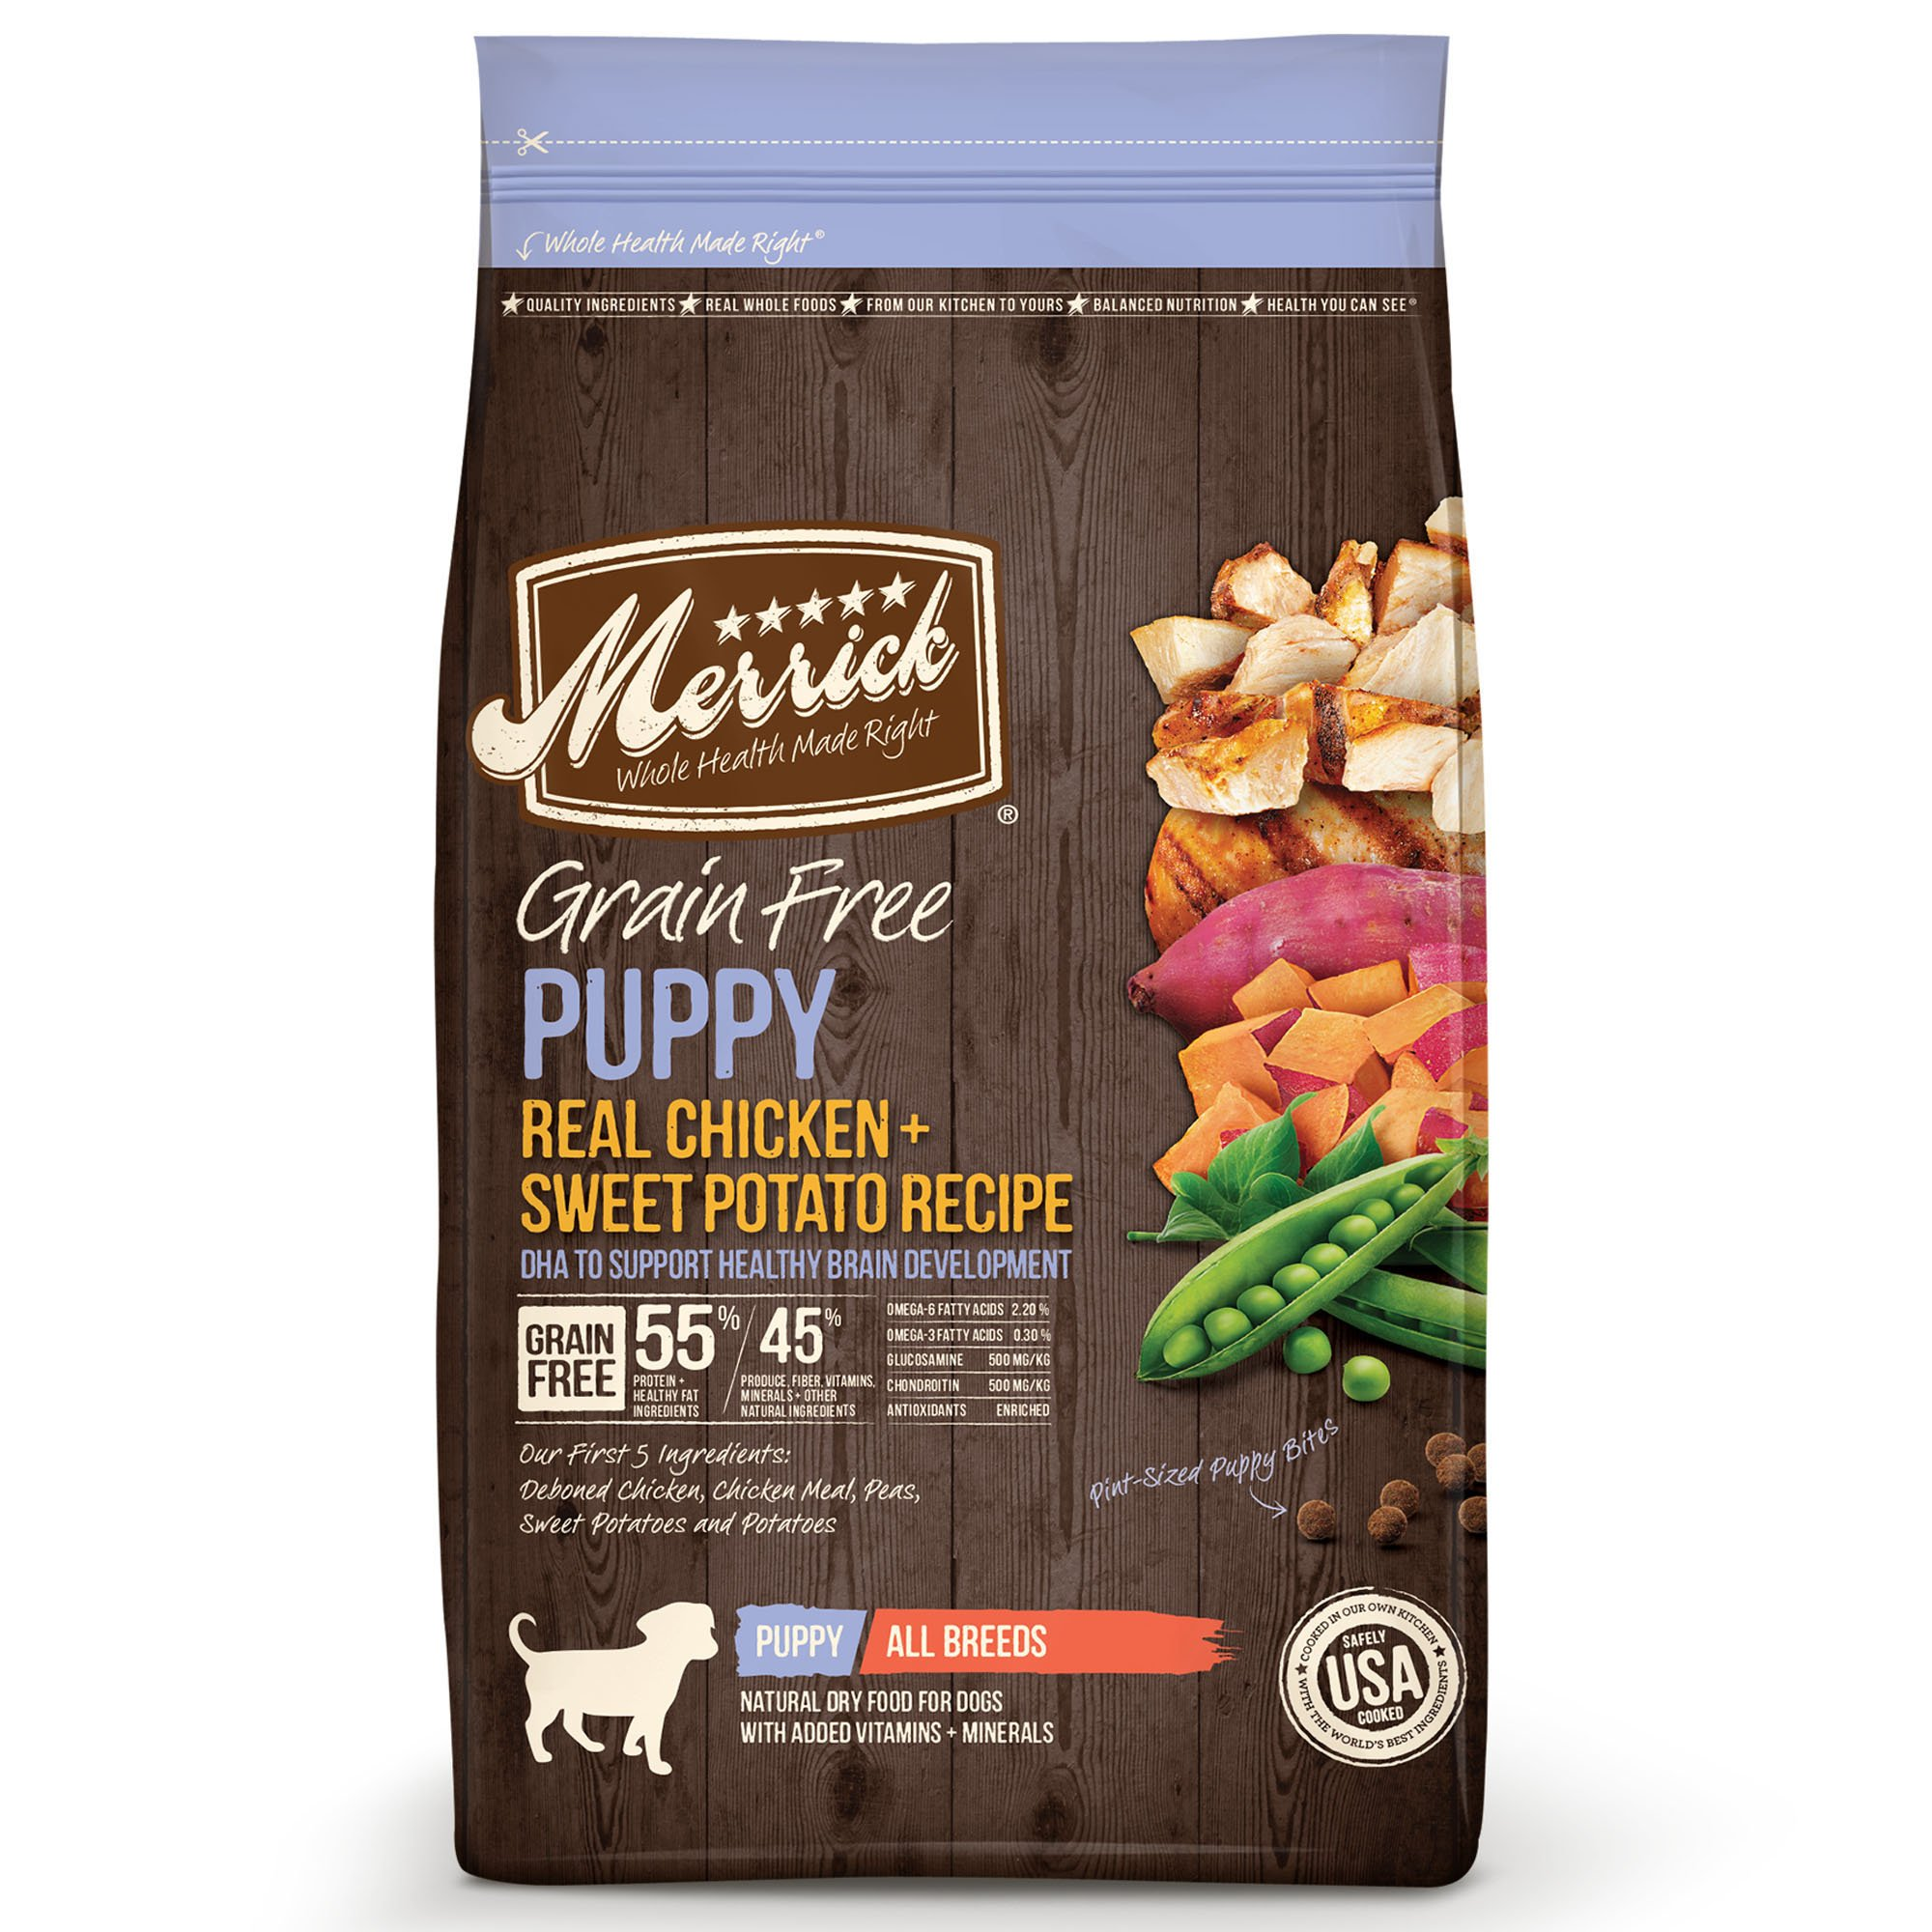 Merrick Grain Free Puppy Real Chicken & Sweet Potato Dry Dog Food, 25 lbs.